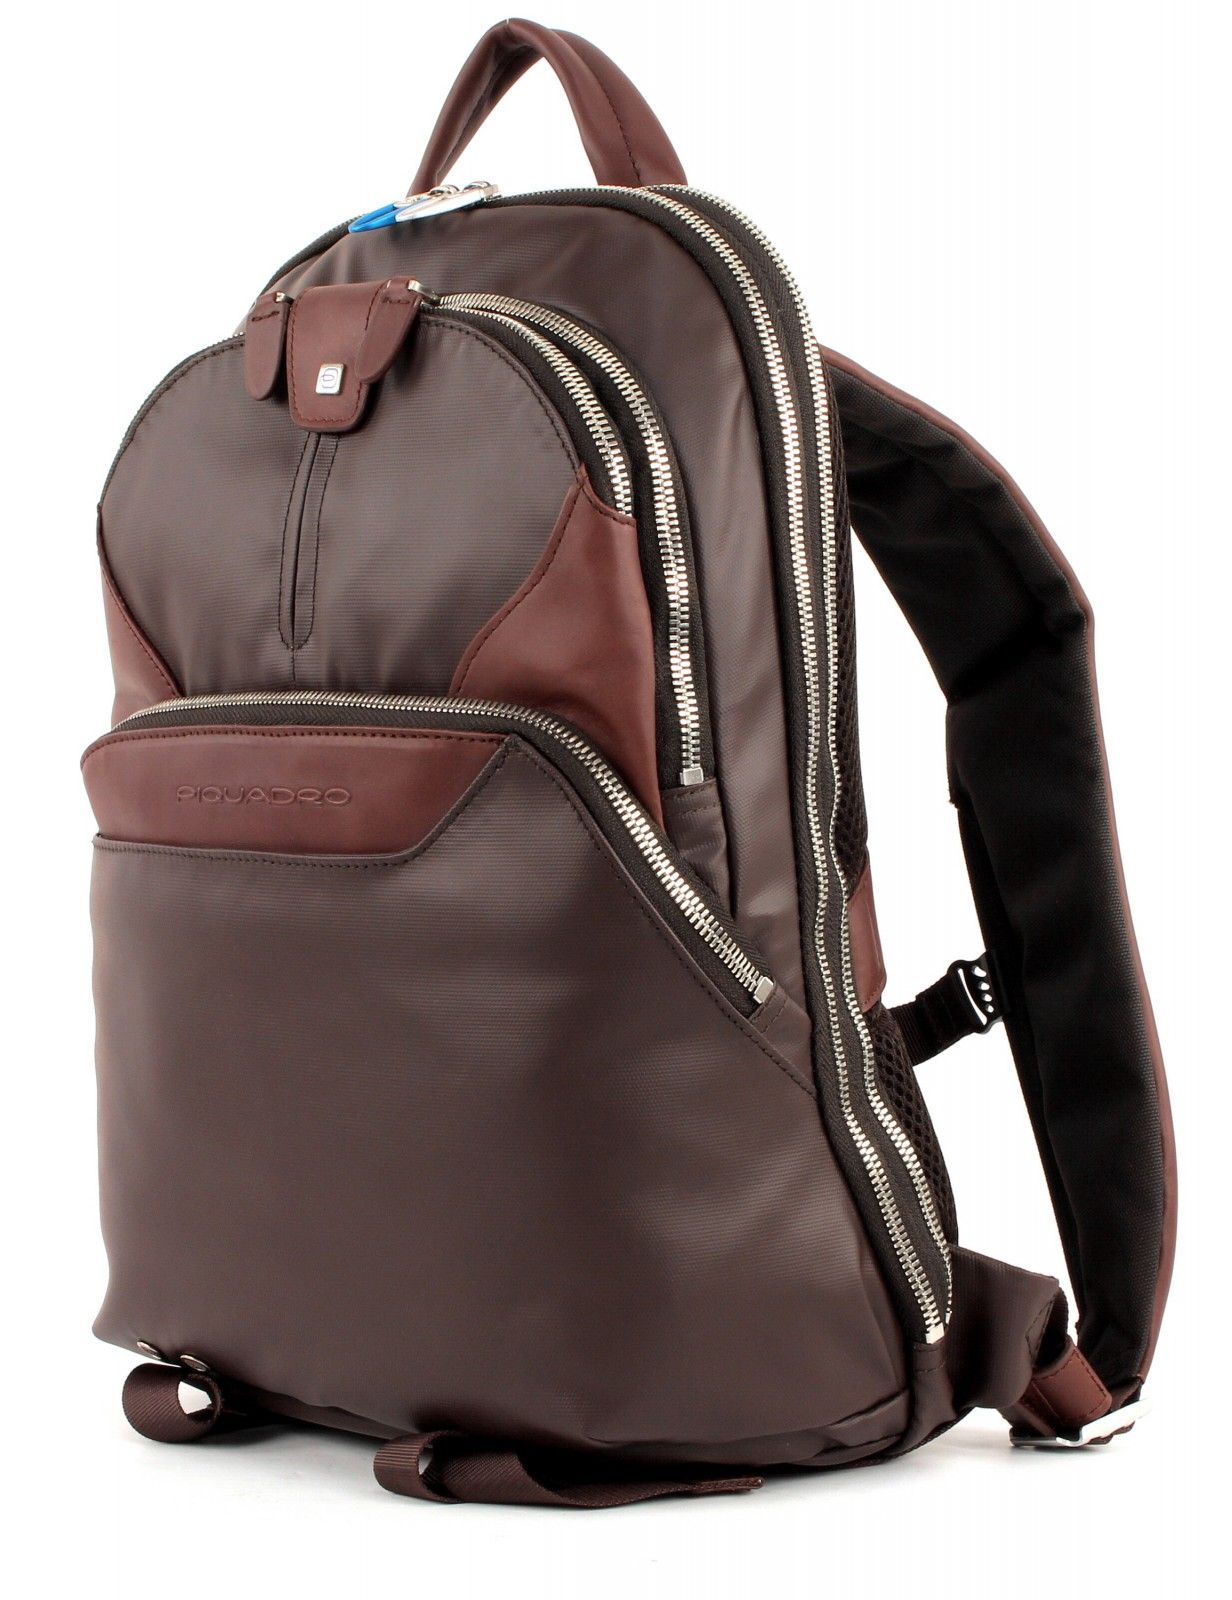 PIQUADRO Coleos Laptop Backpack Testa di Moro